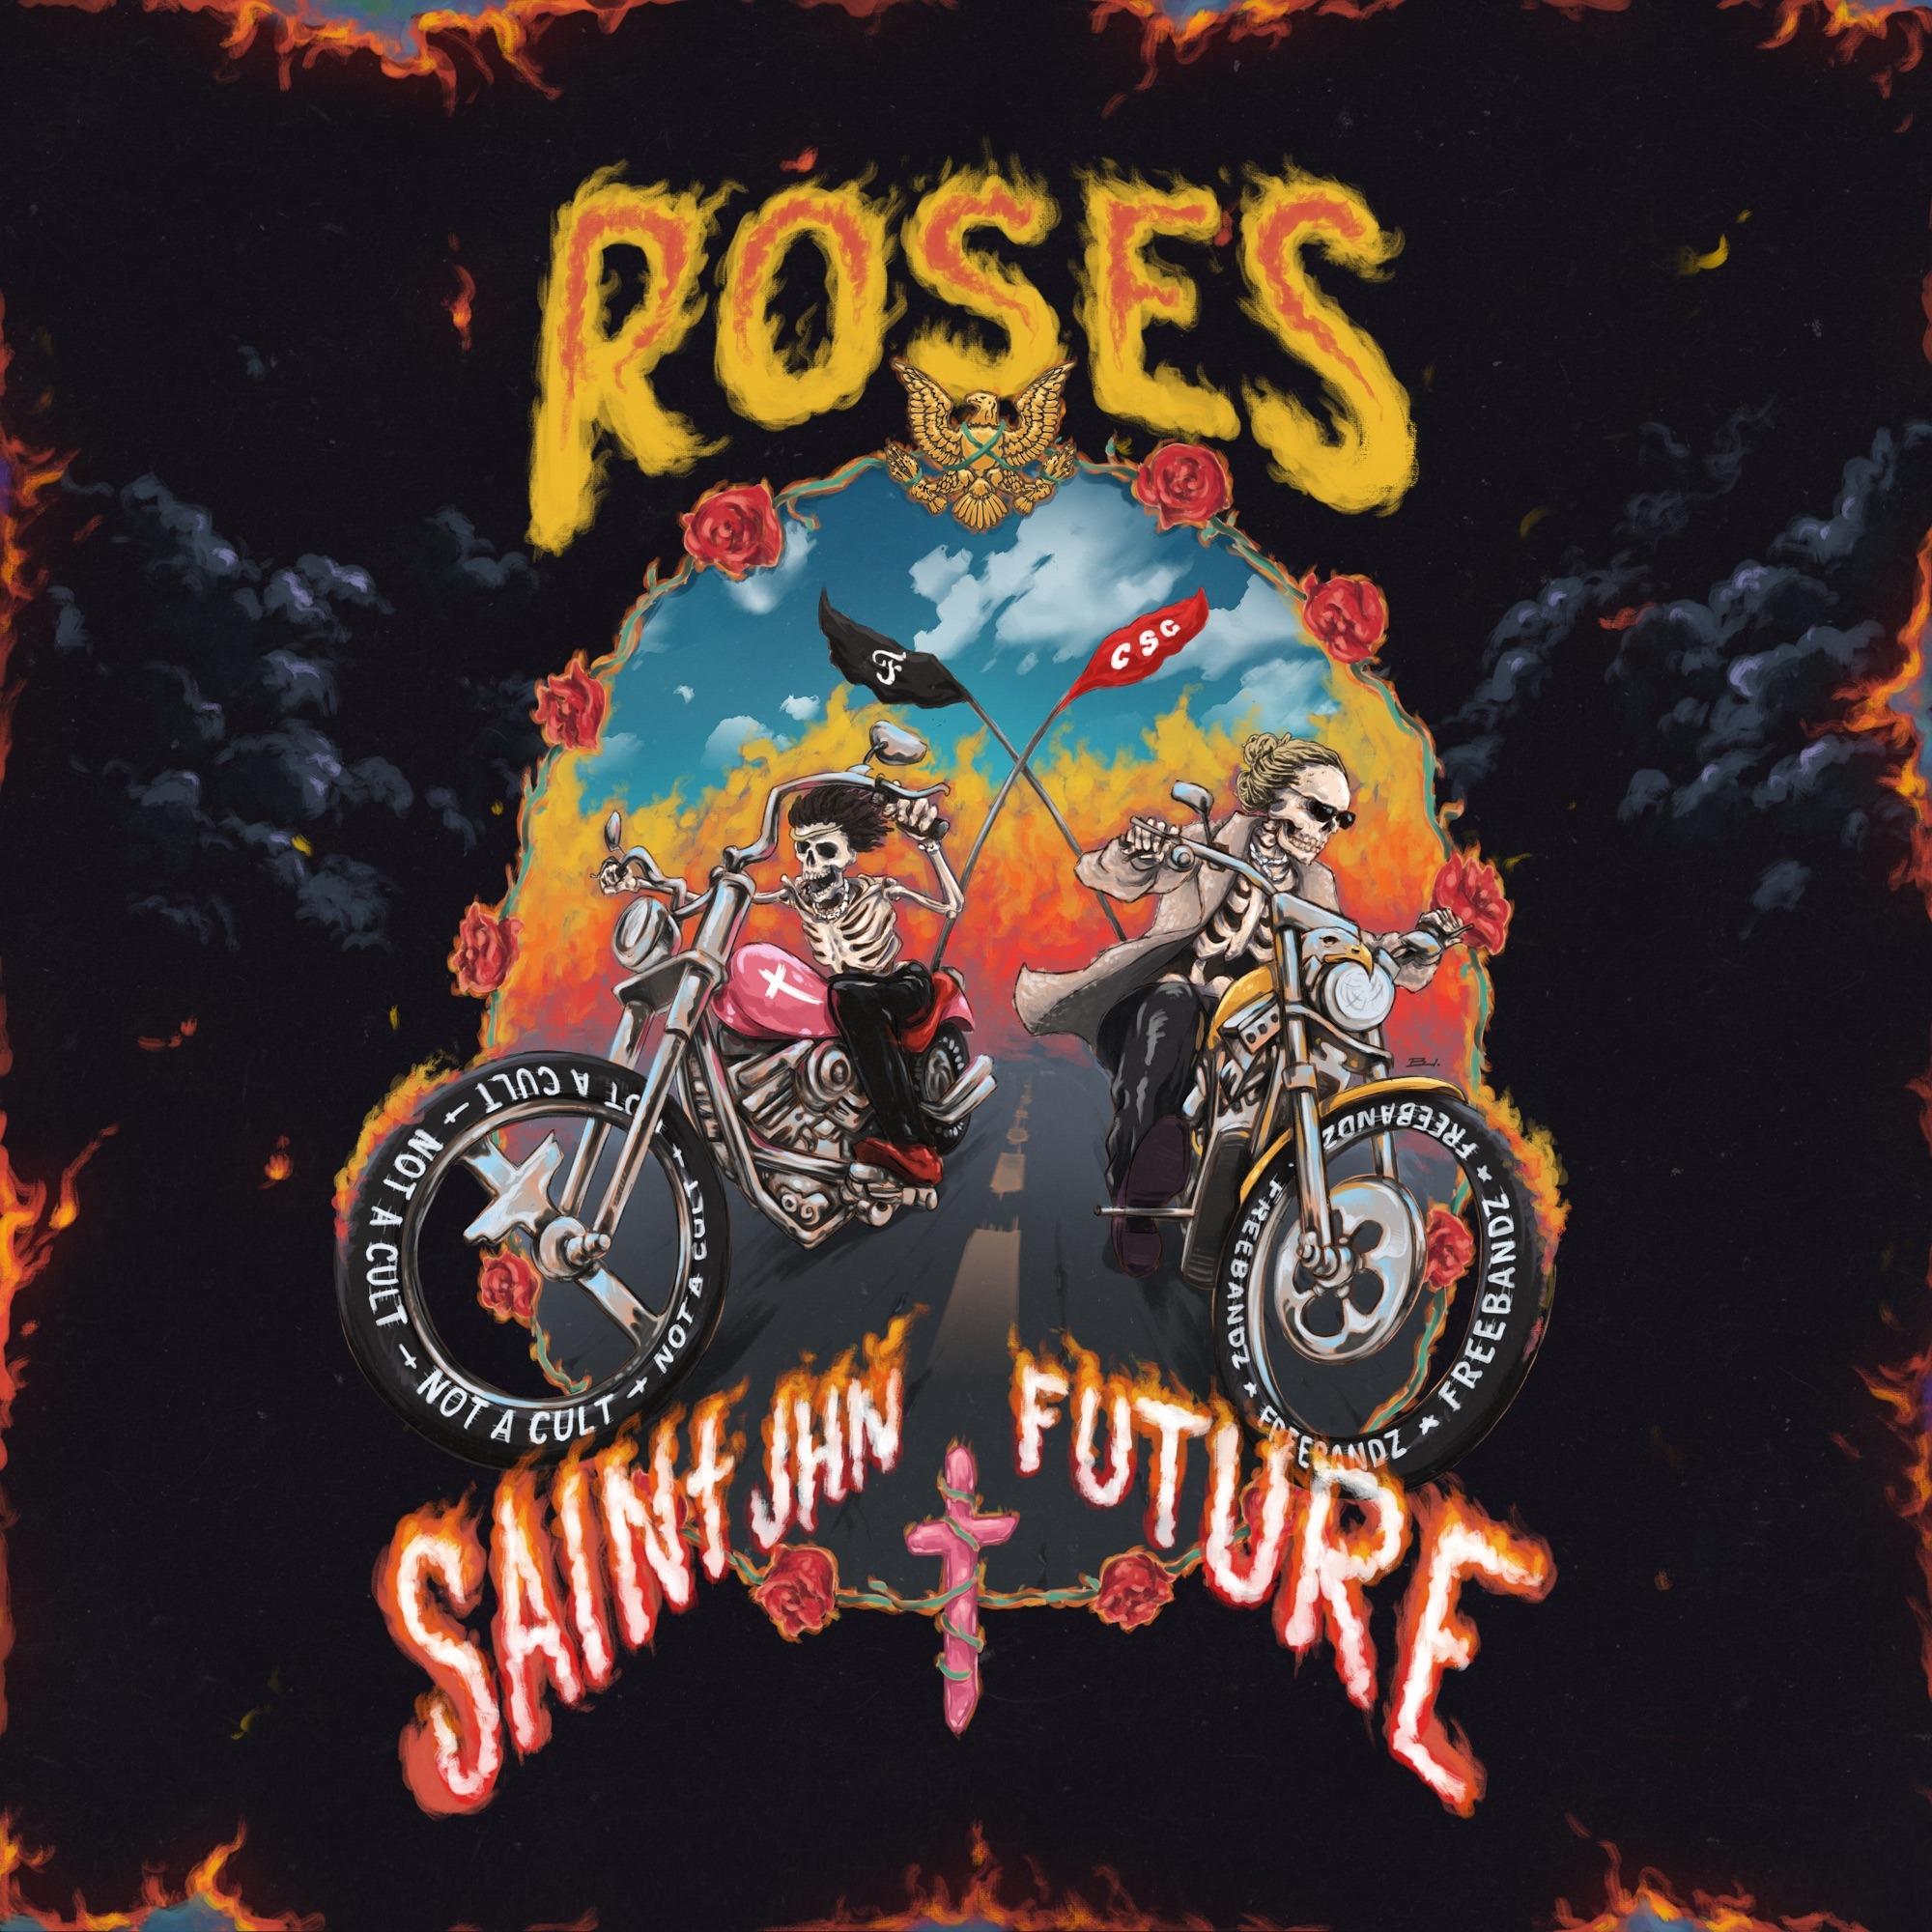 SAINt JHN feat. Future - Roses (Remix)